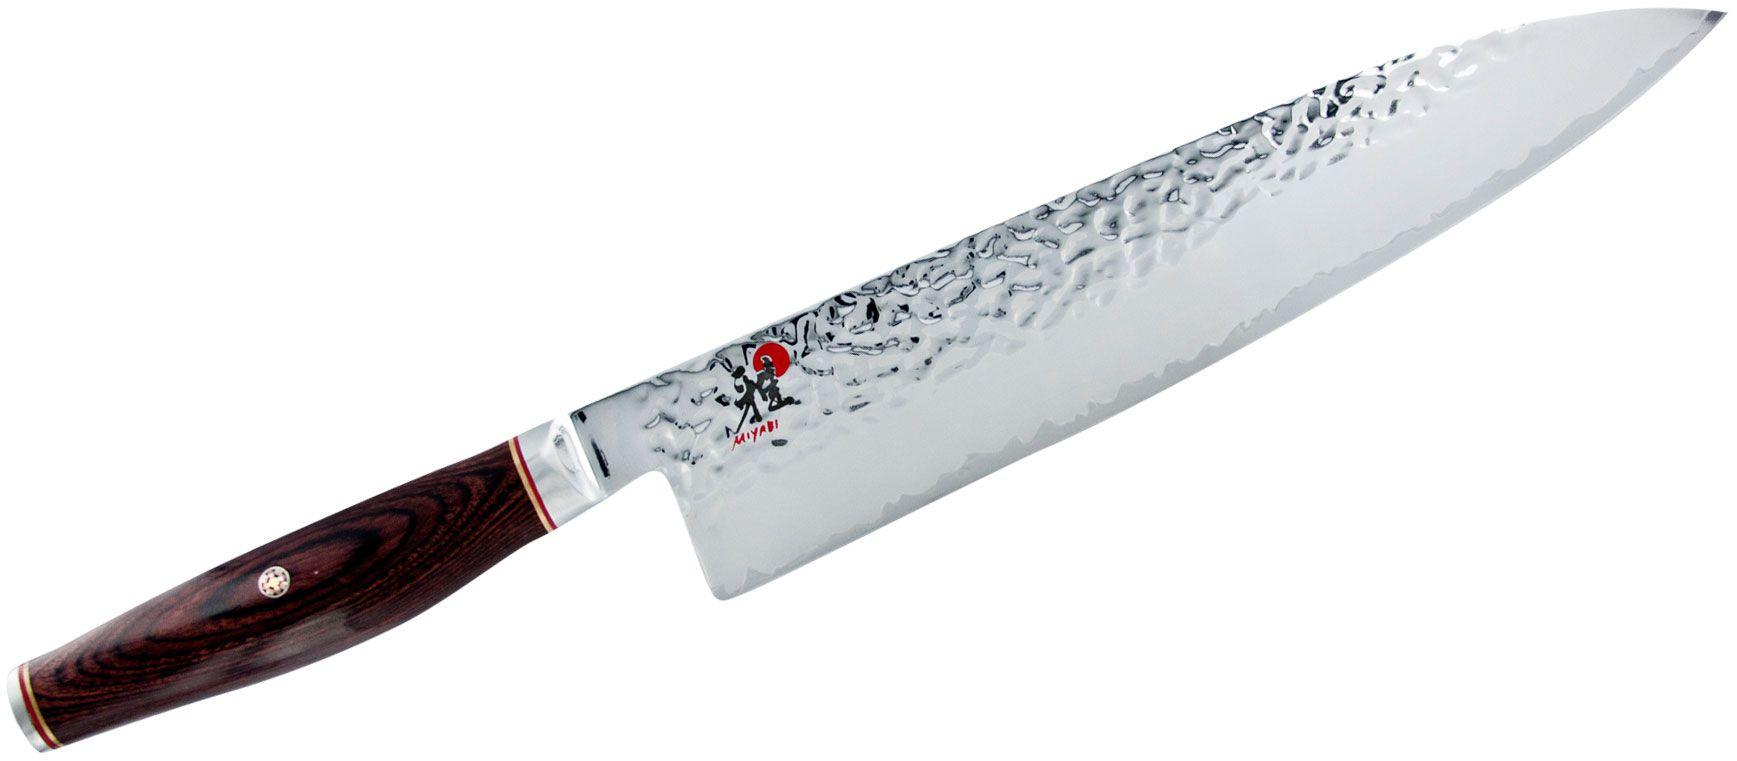 Zwilling J.A. Henckels Miyabi Kaizen Artisan 8 inch Chef's Knife, Pakkawood Handle